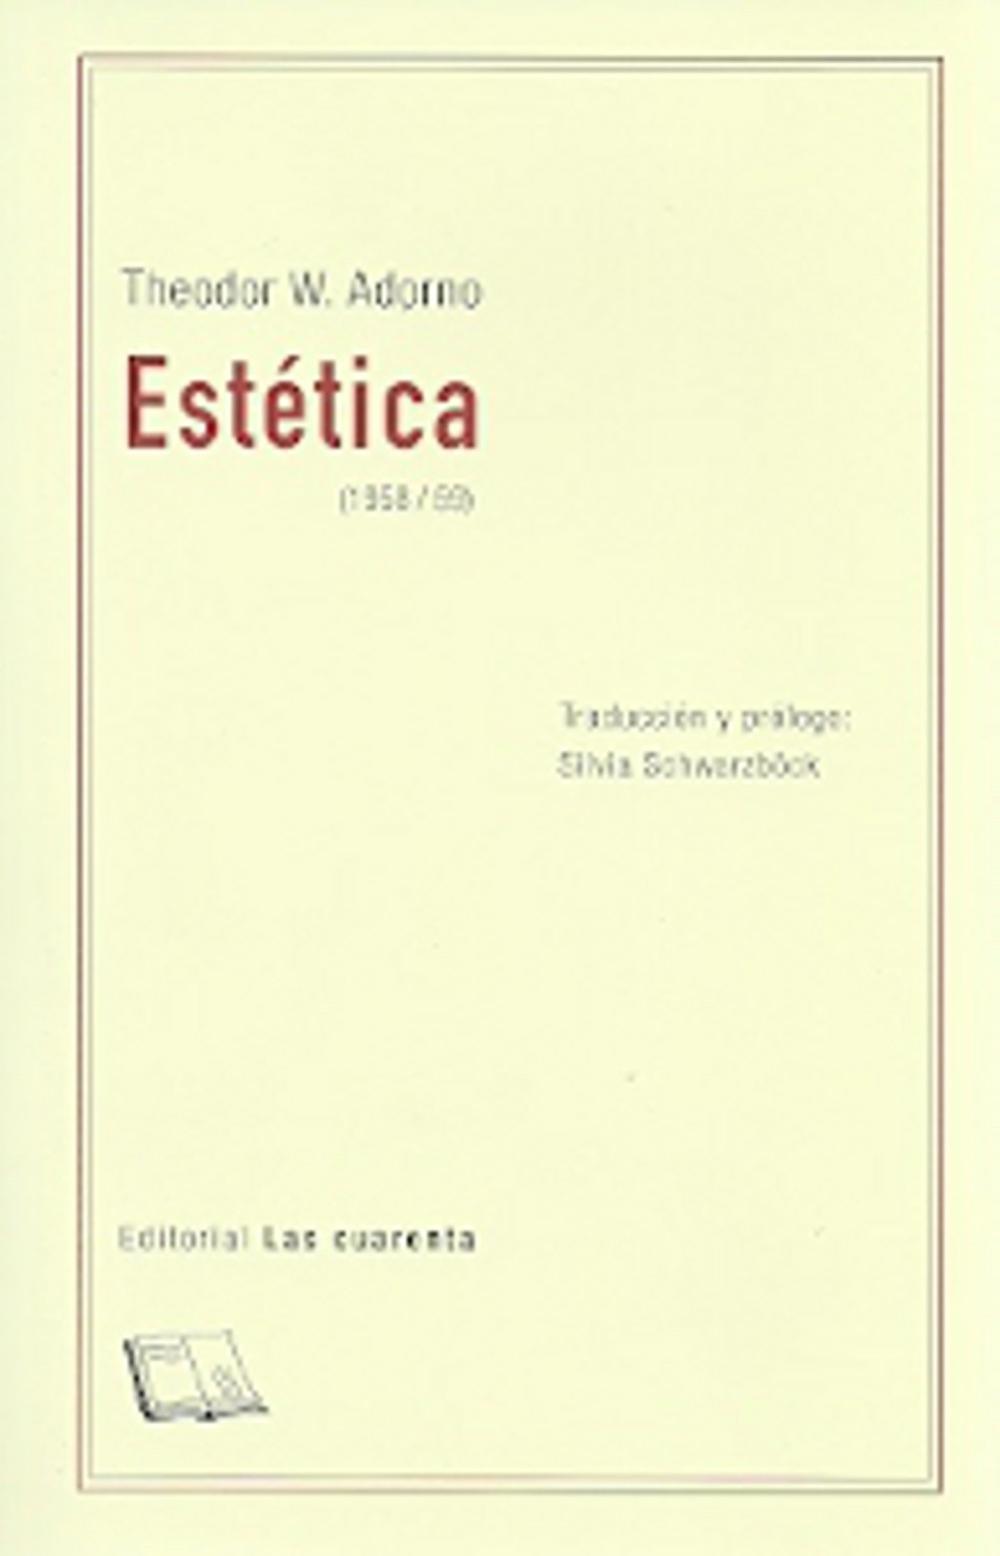 ESTÉTICA (1958/59)